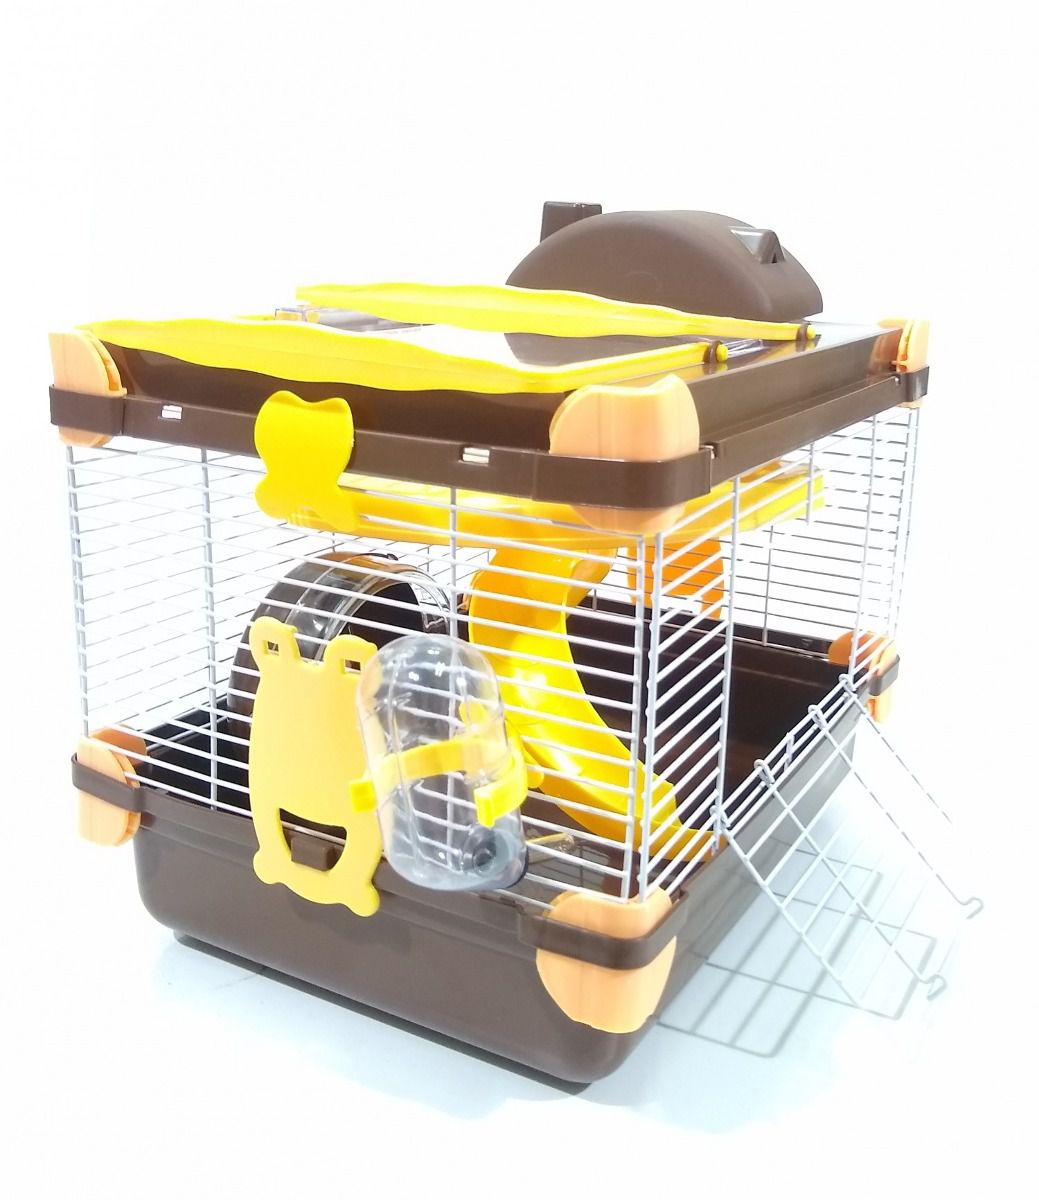 Gaiola Hamster Vip Acrílico Completa Rosa 24cm x 30cm x 24cm